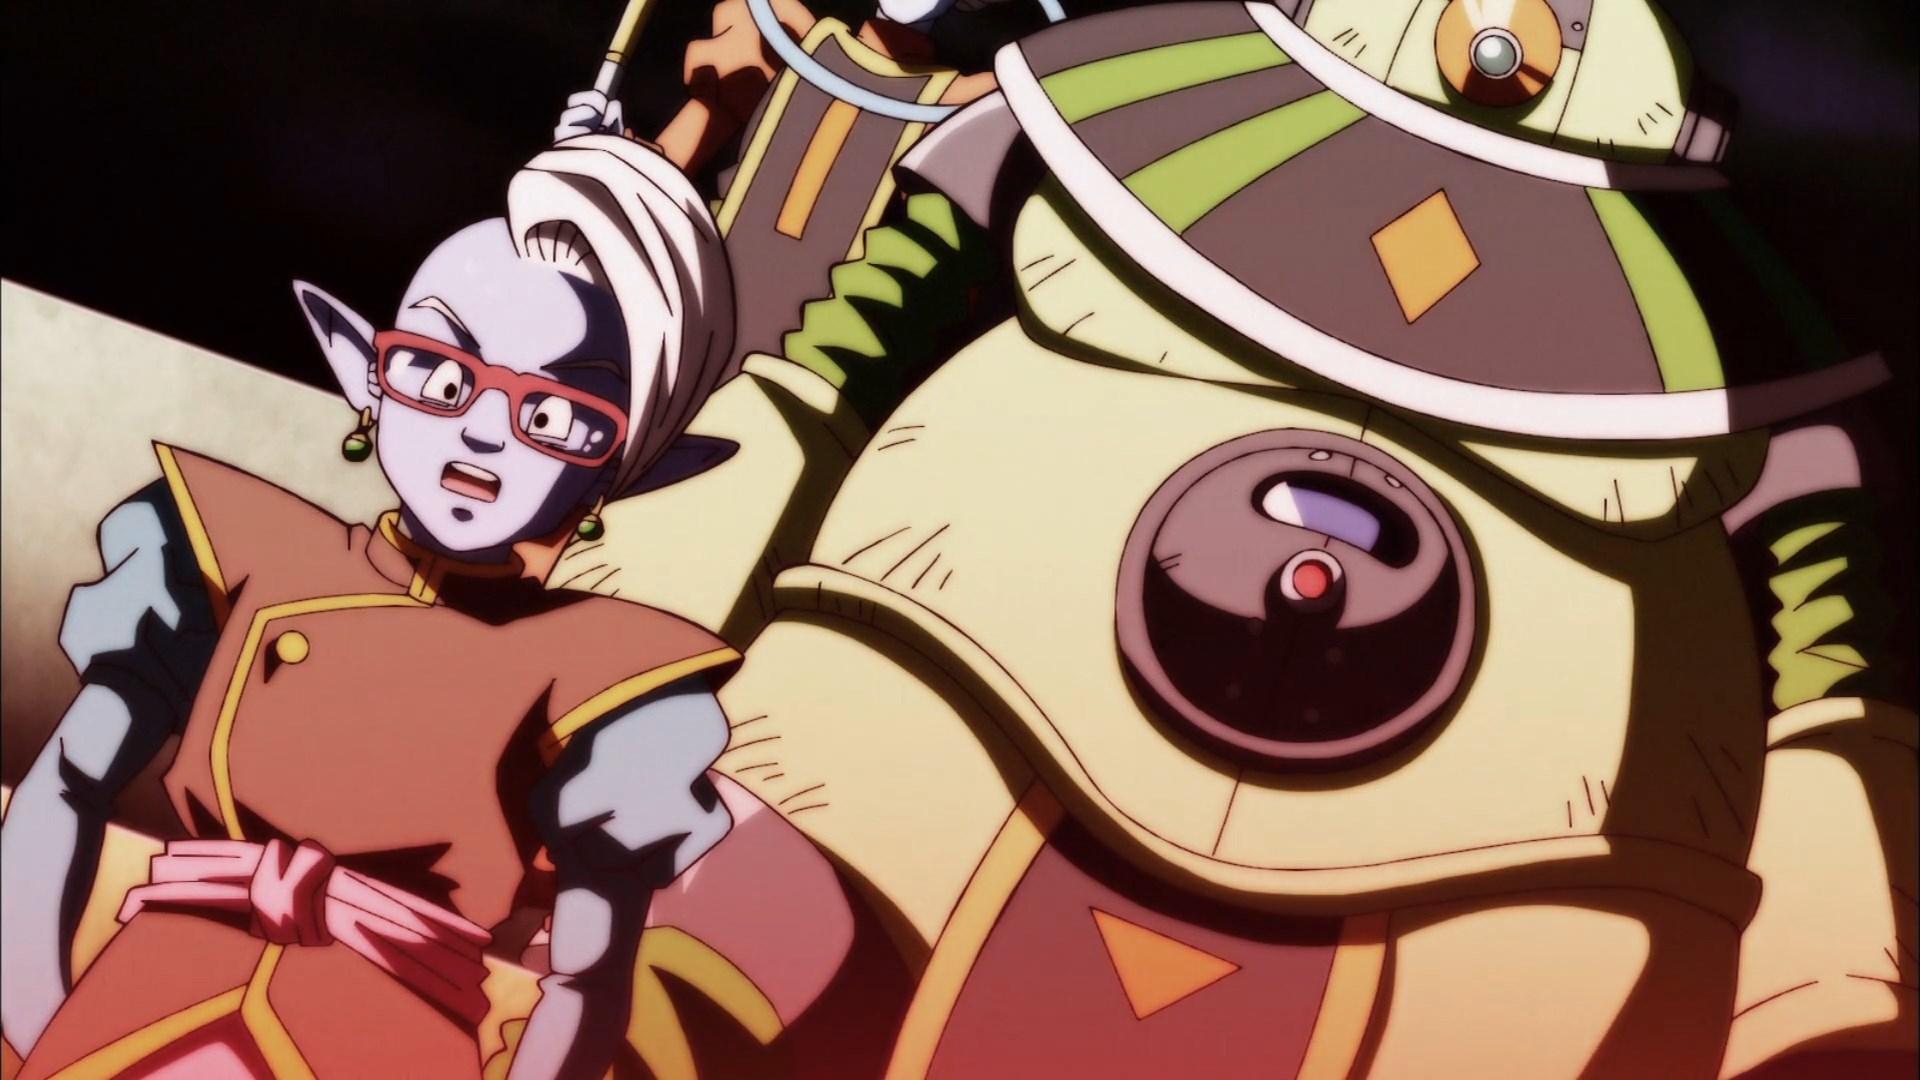 [HorribleSubs] Dragon Ball Super - 121 [1080p].mkv_snapshot_18.54